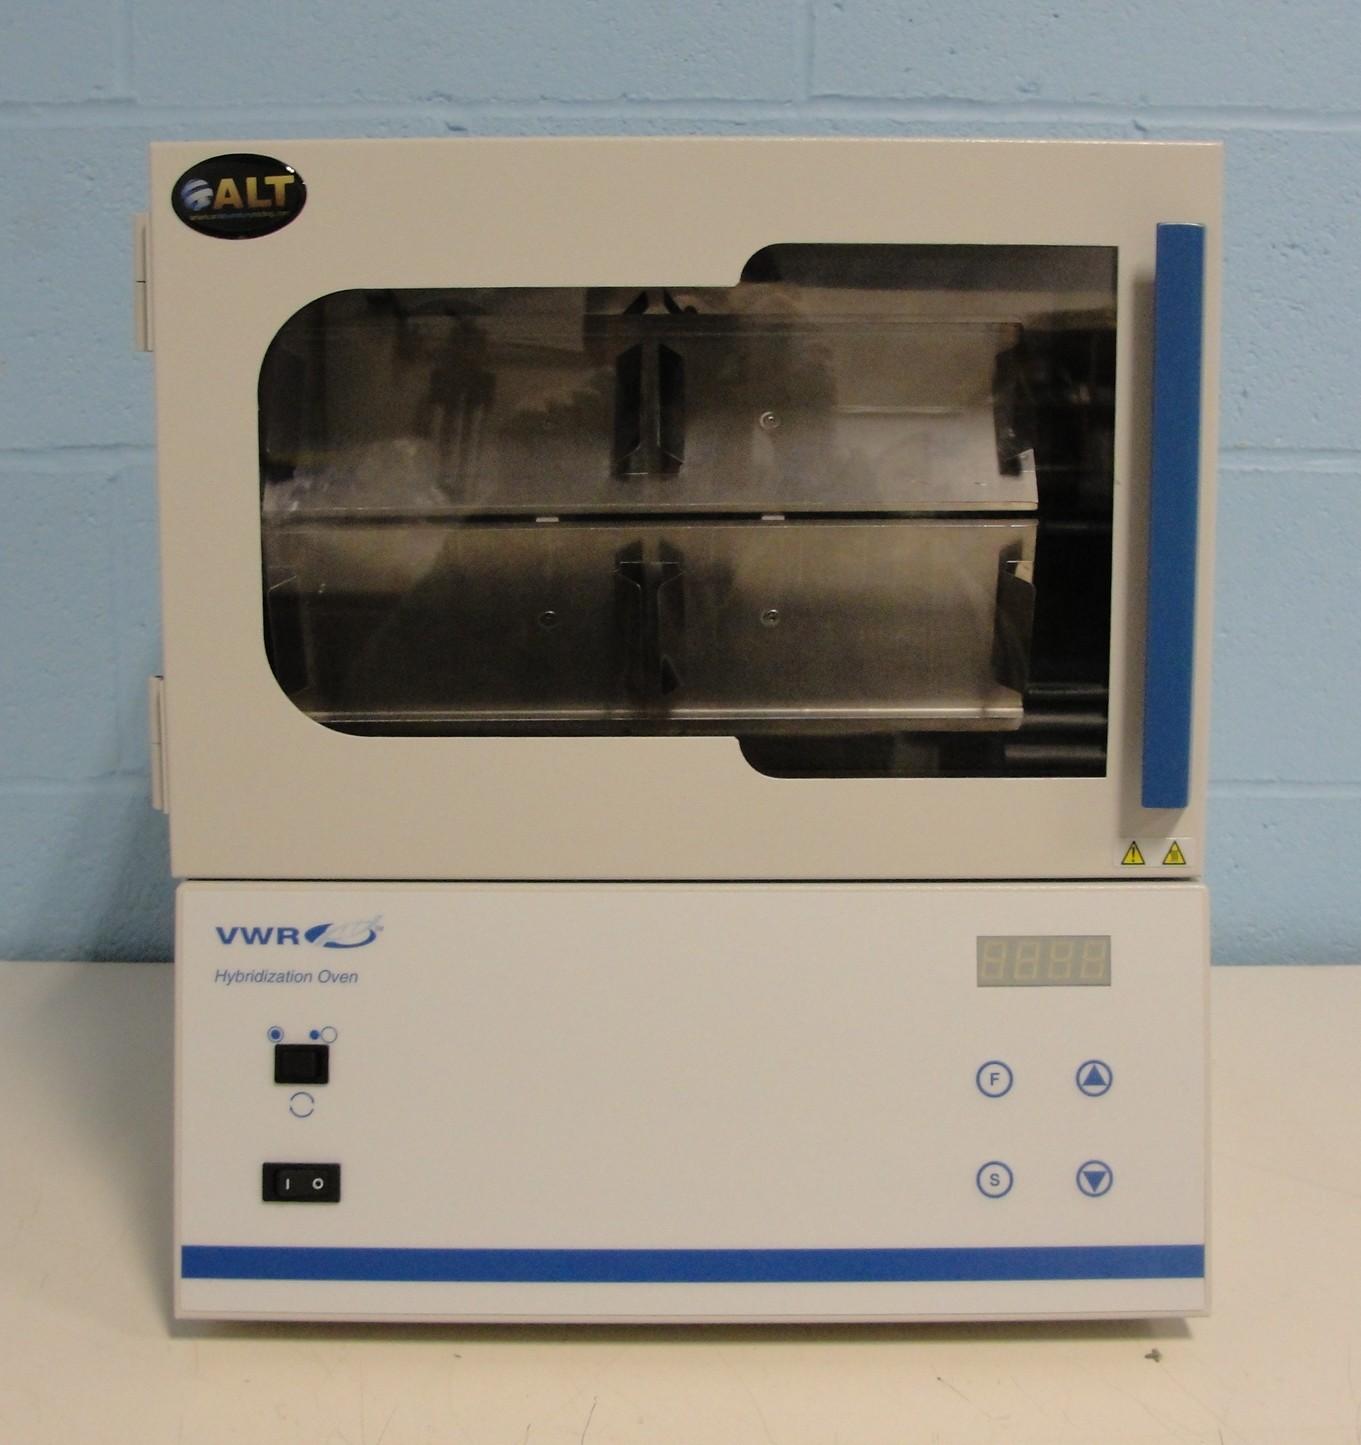 VWR / Boekel Hybridization Big SHOT II Oven Image